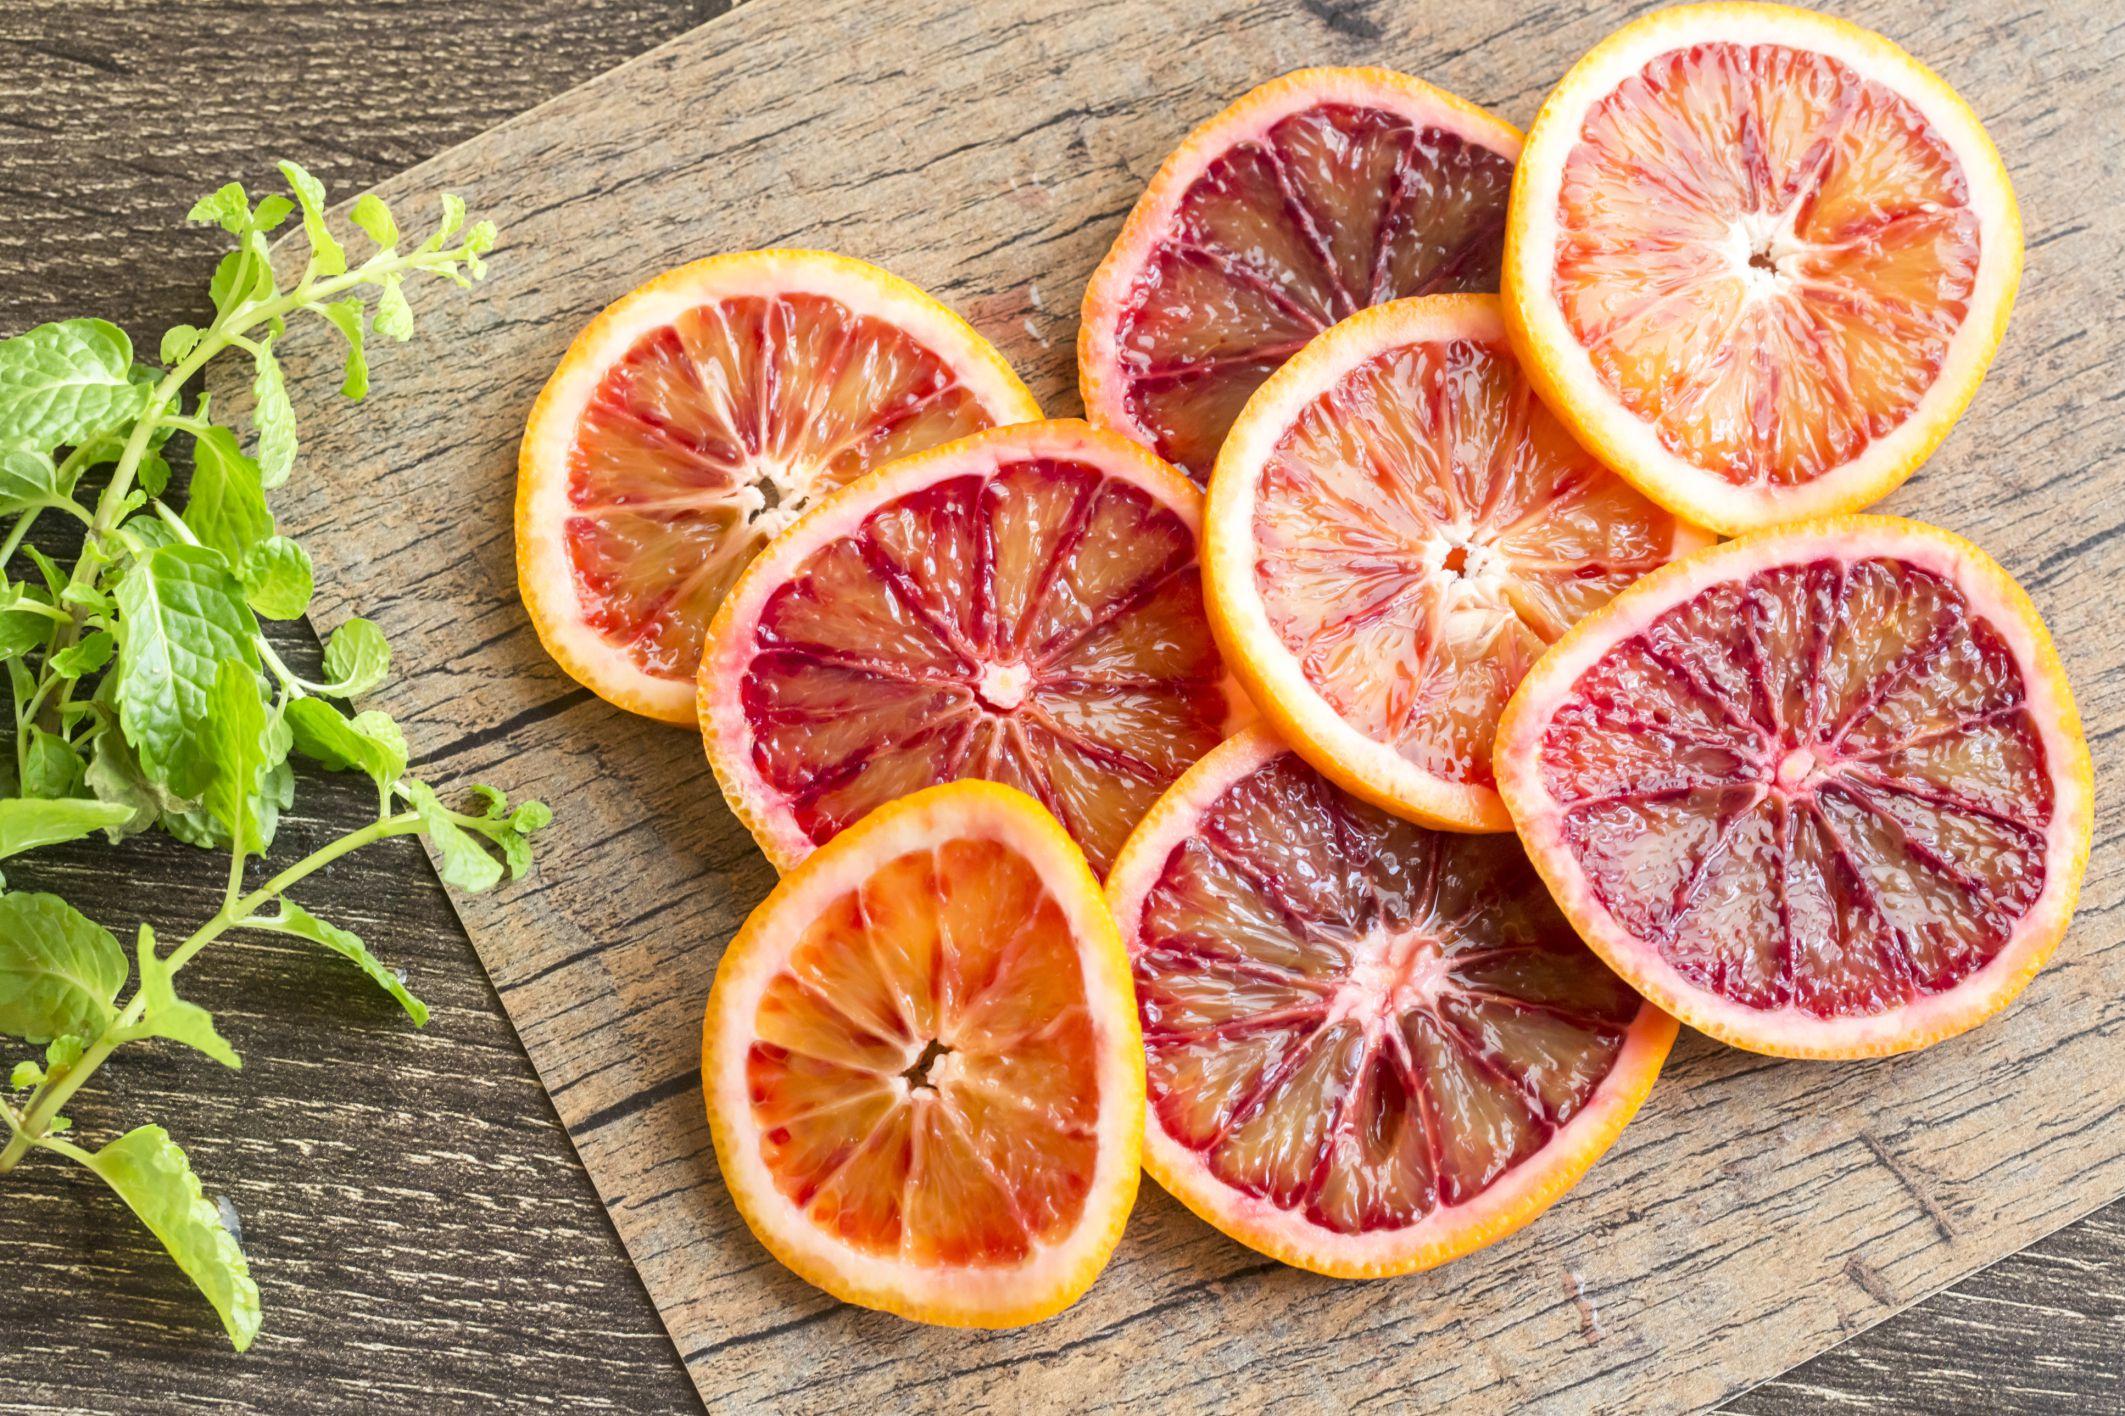 Different Blood Orange Slices